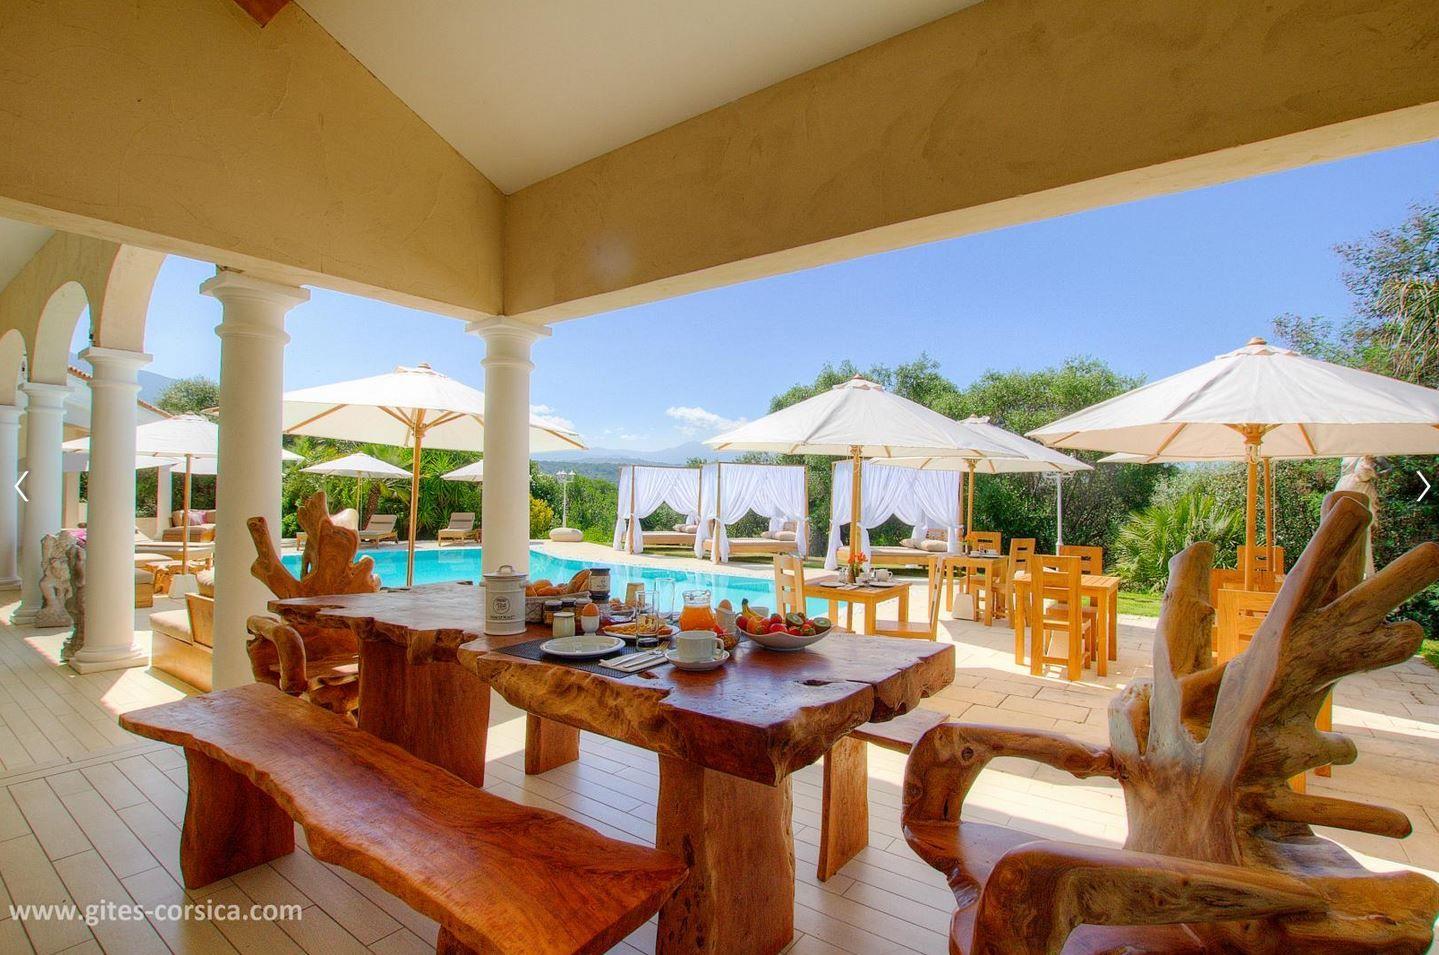 Chambre D Hotes Villa Torrella A Sarrola Carcopino Location De Vacances En Corse Le Grand Ajaccio Site Officiel Gites De France Corse Gite De France Locations Vacances Gite